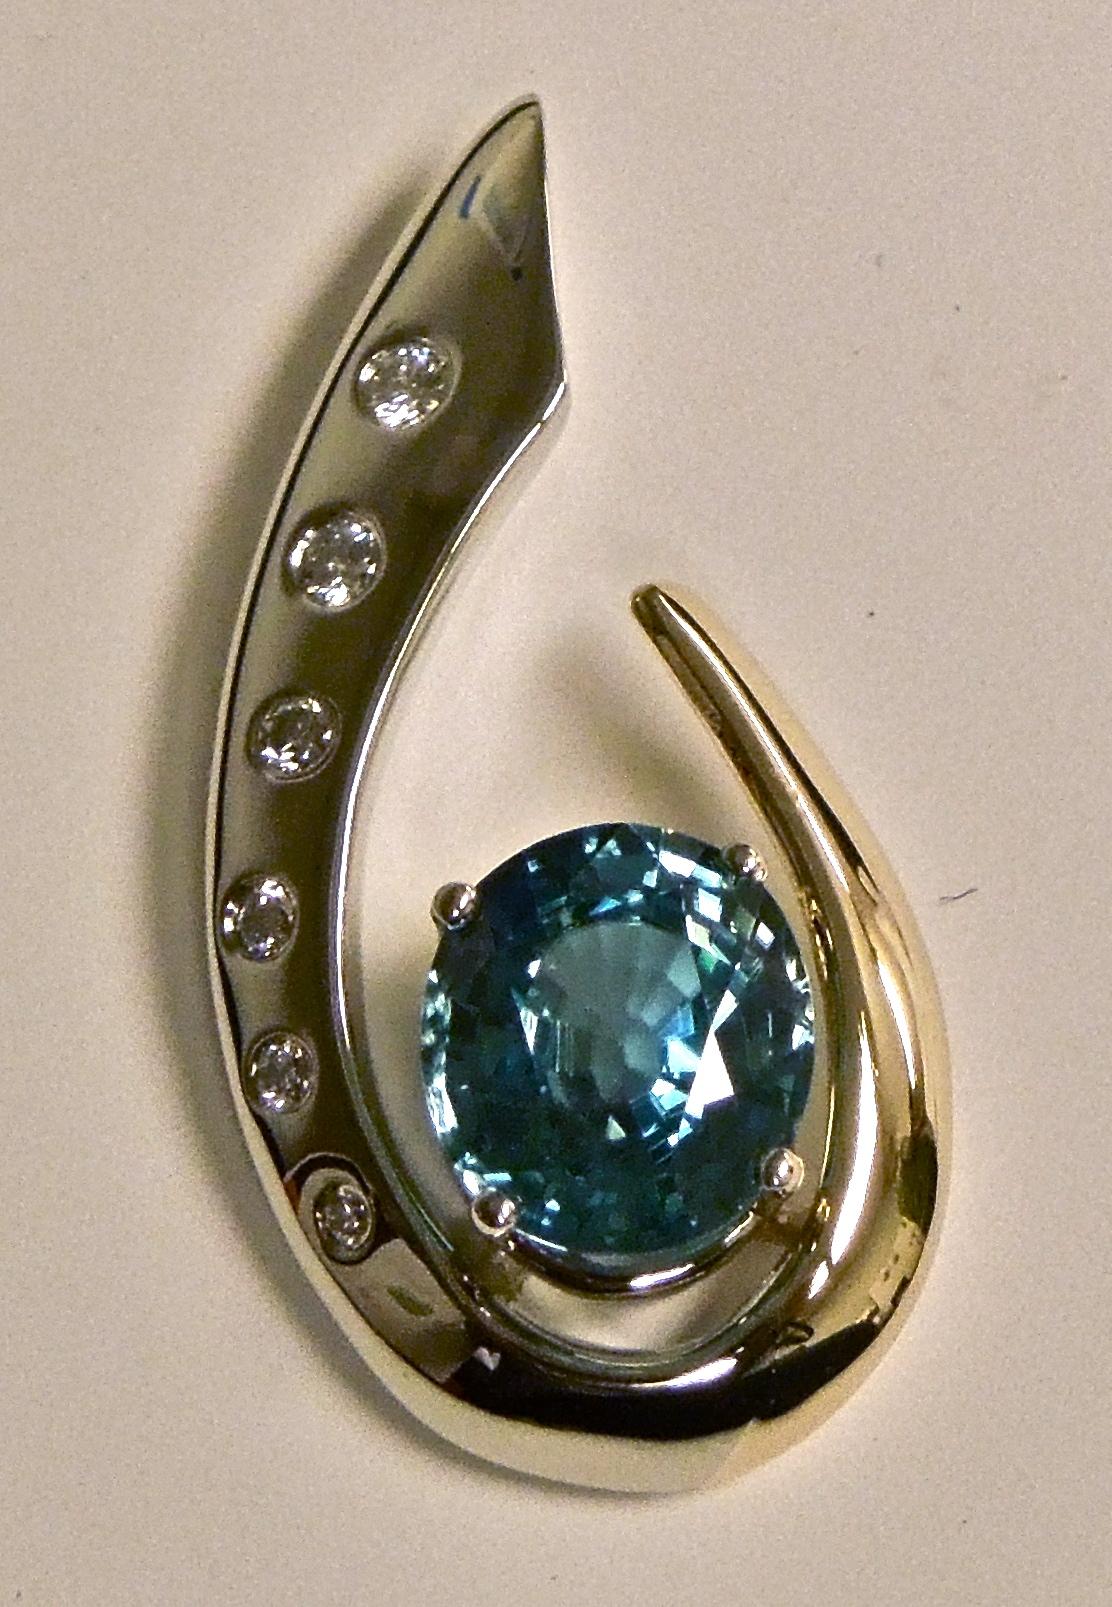 unique-ladies-tourmaline-pendant-diamond-accents-yellow-gold-pendant-craft-revival-jewelry-store-grand-rapids